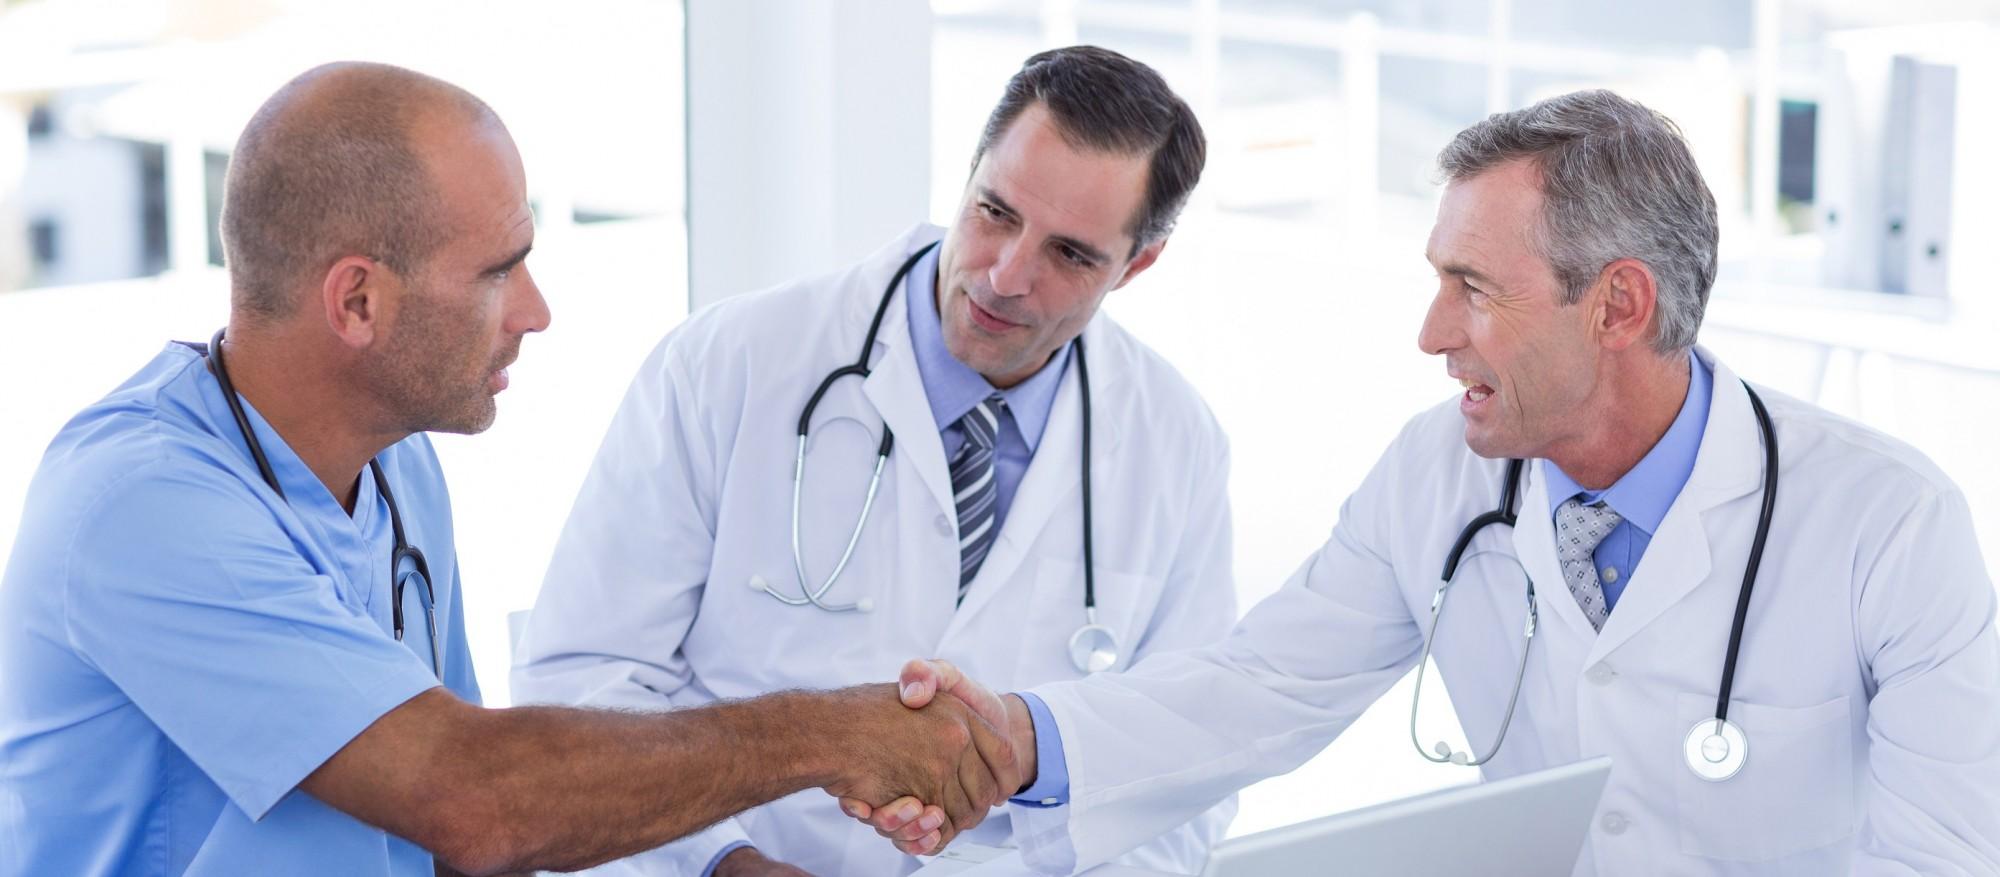 PhysiciansHospitals2-e1459991439275-2000x877.jpg